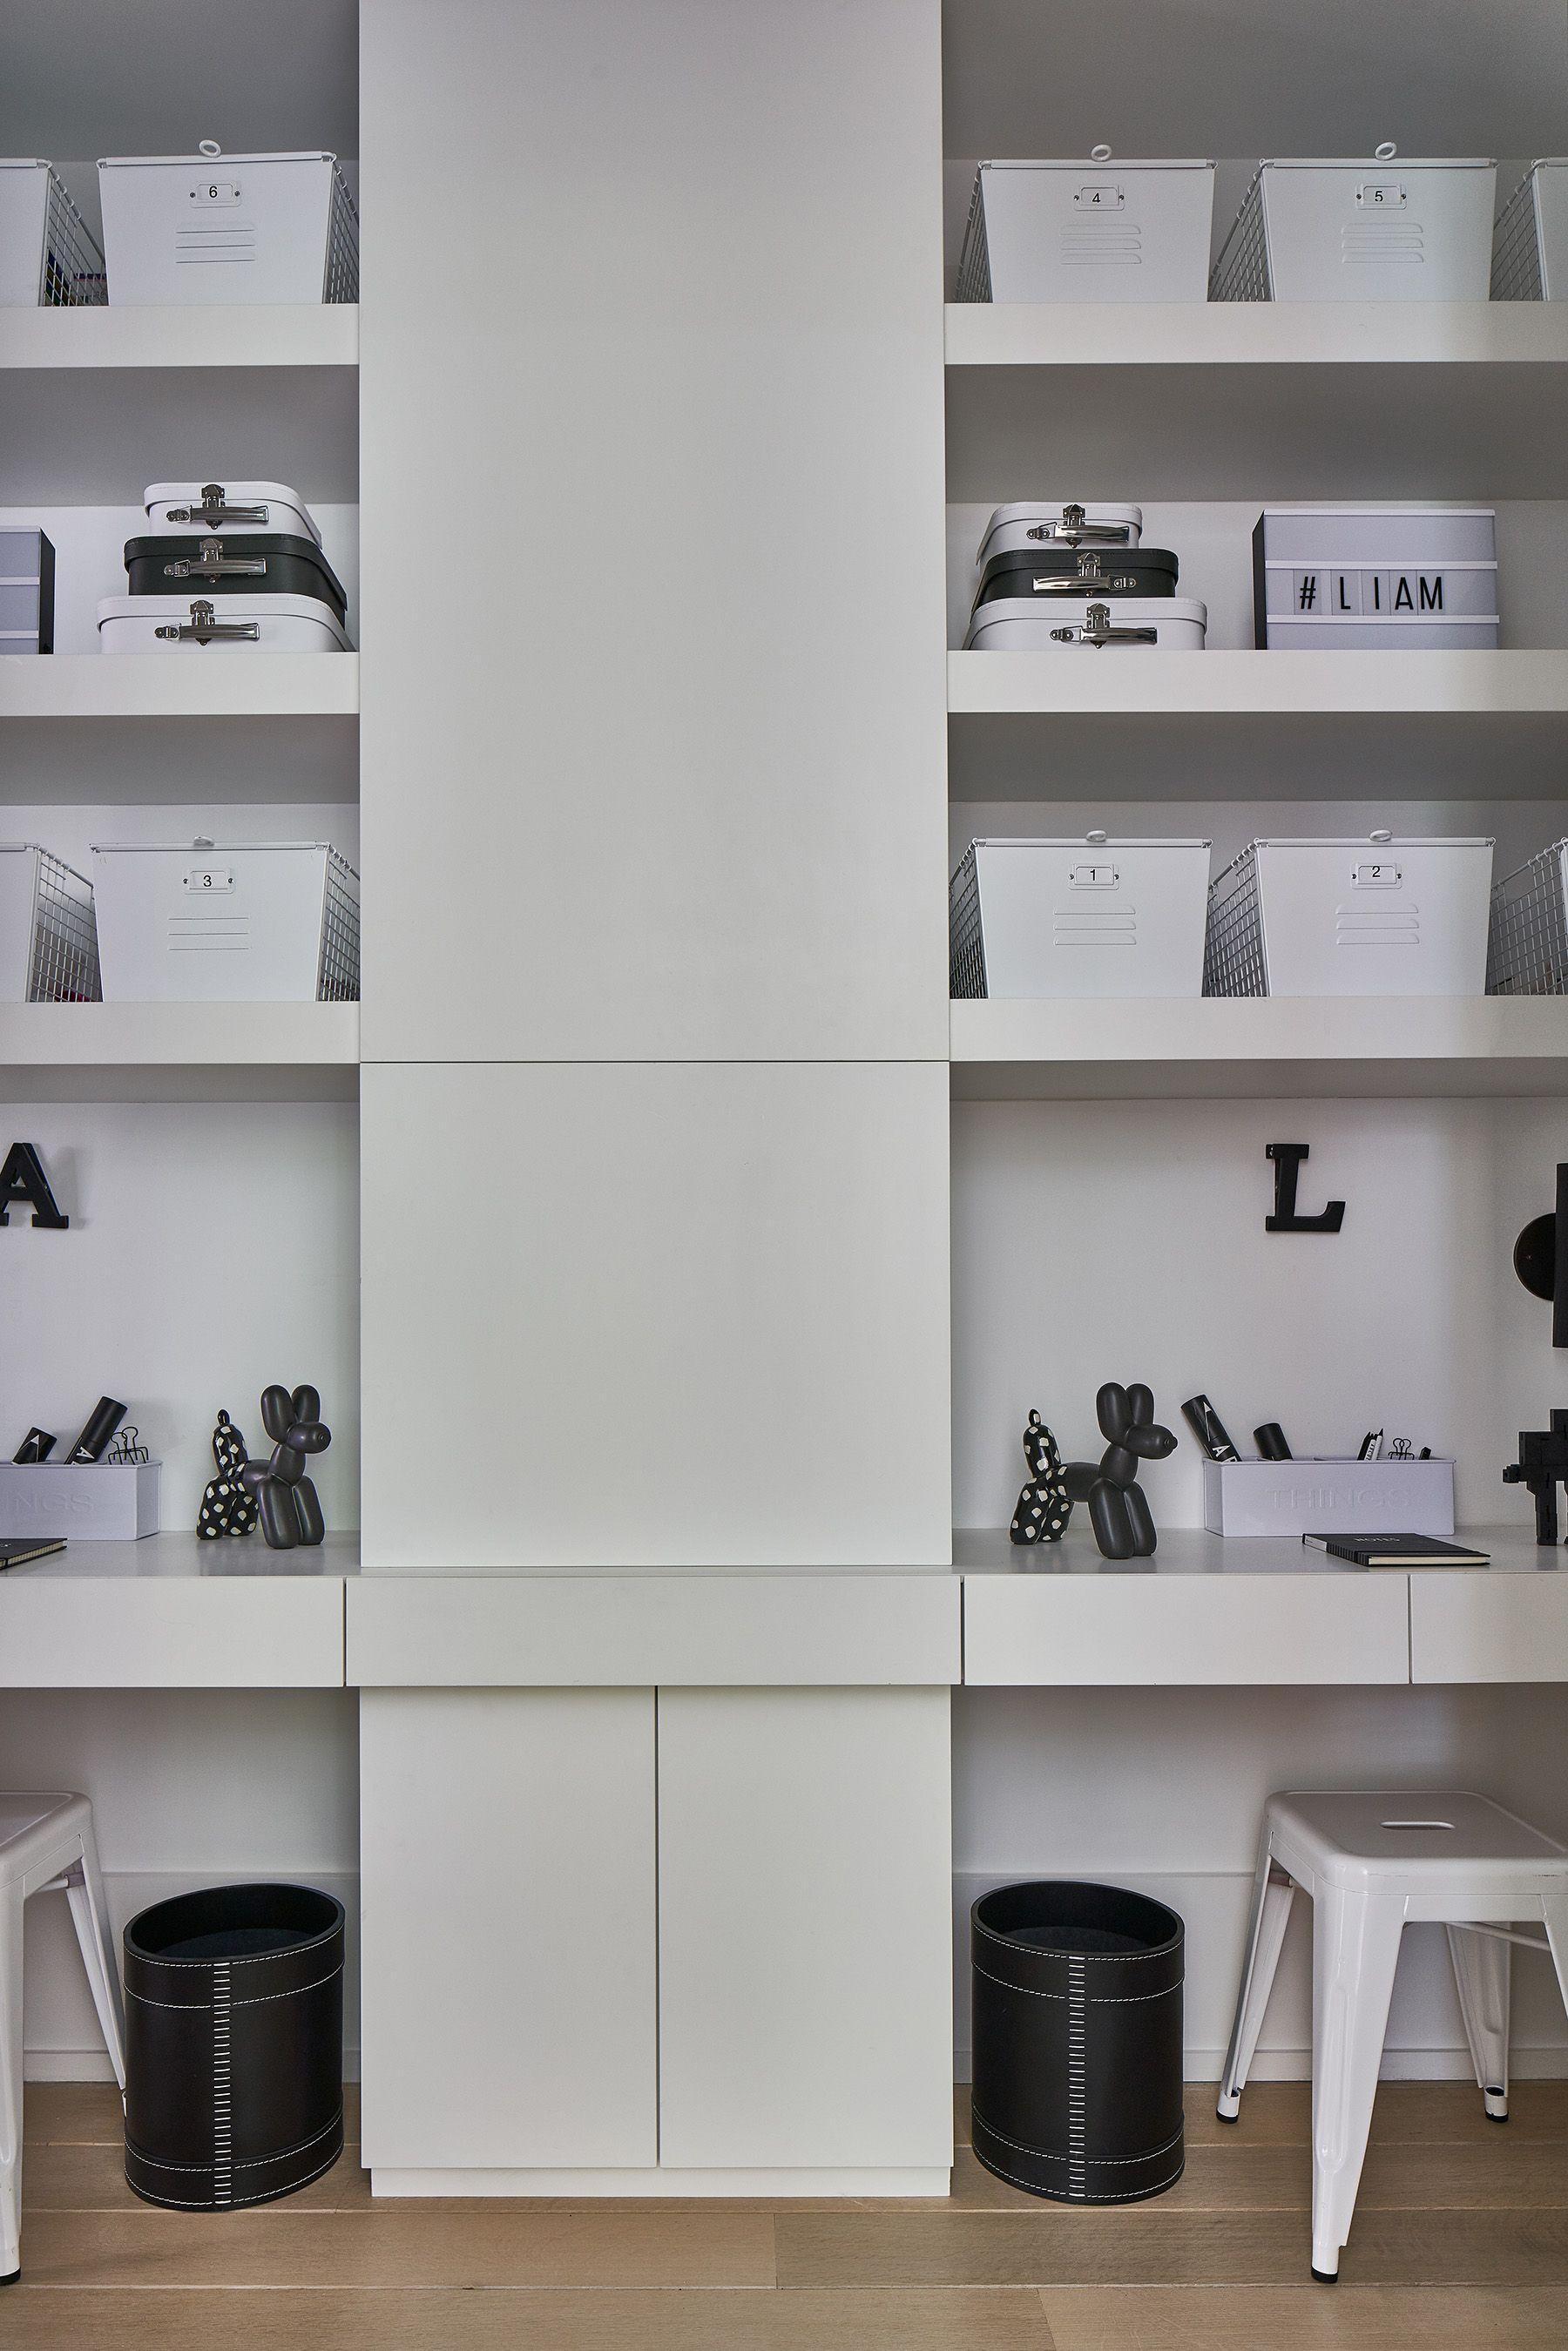 30 Toy Storage Ideas How To Organize Store Your Kids Toys